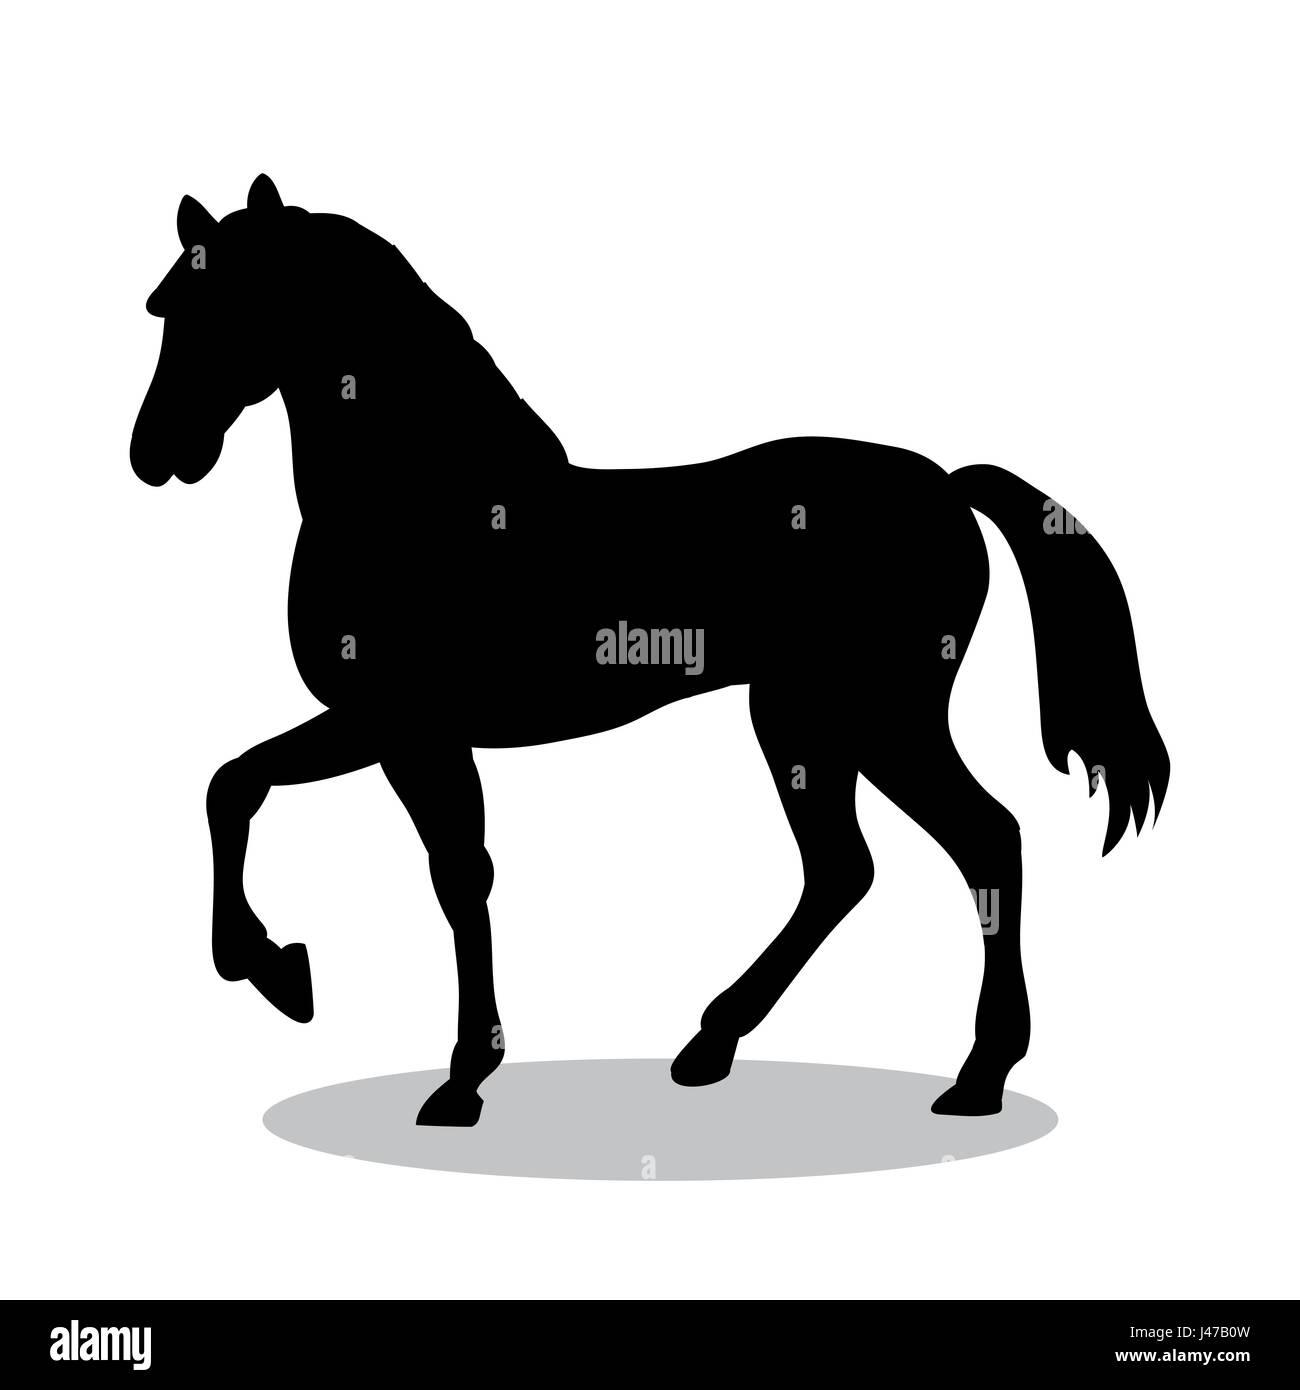 Horse farm mammal black silhouette animal - Stock Image